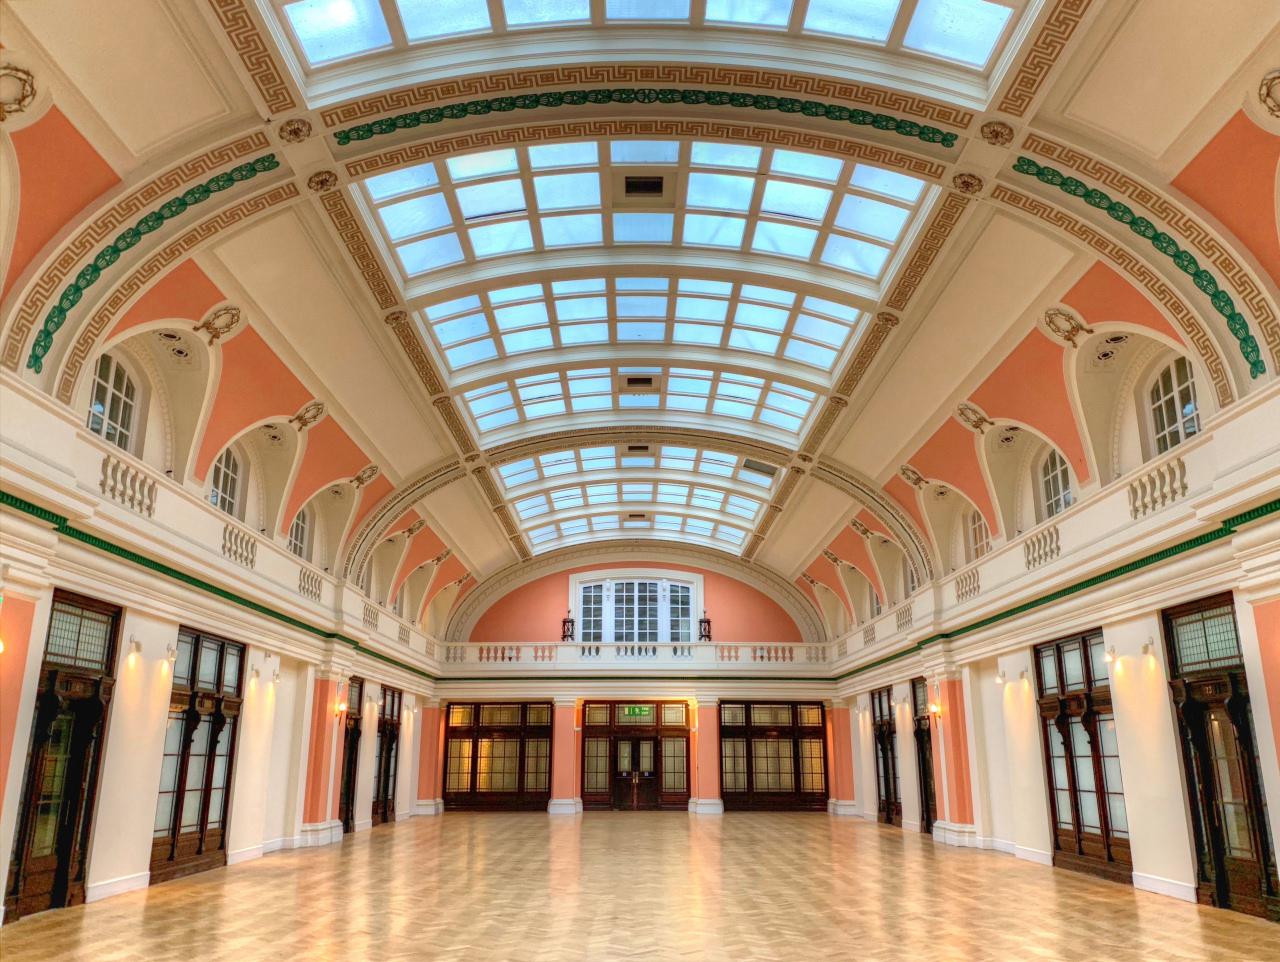 My London Walks: The Grand Hall, former Metropolitan Water Board Headquarters, New River Head